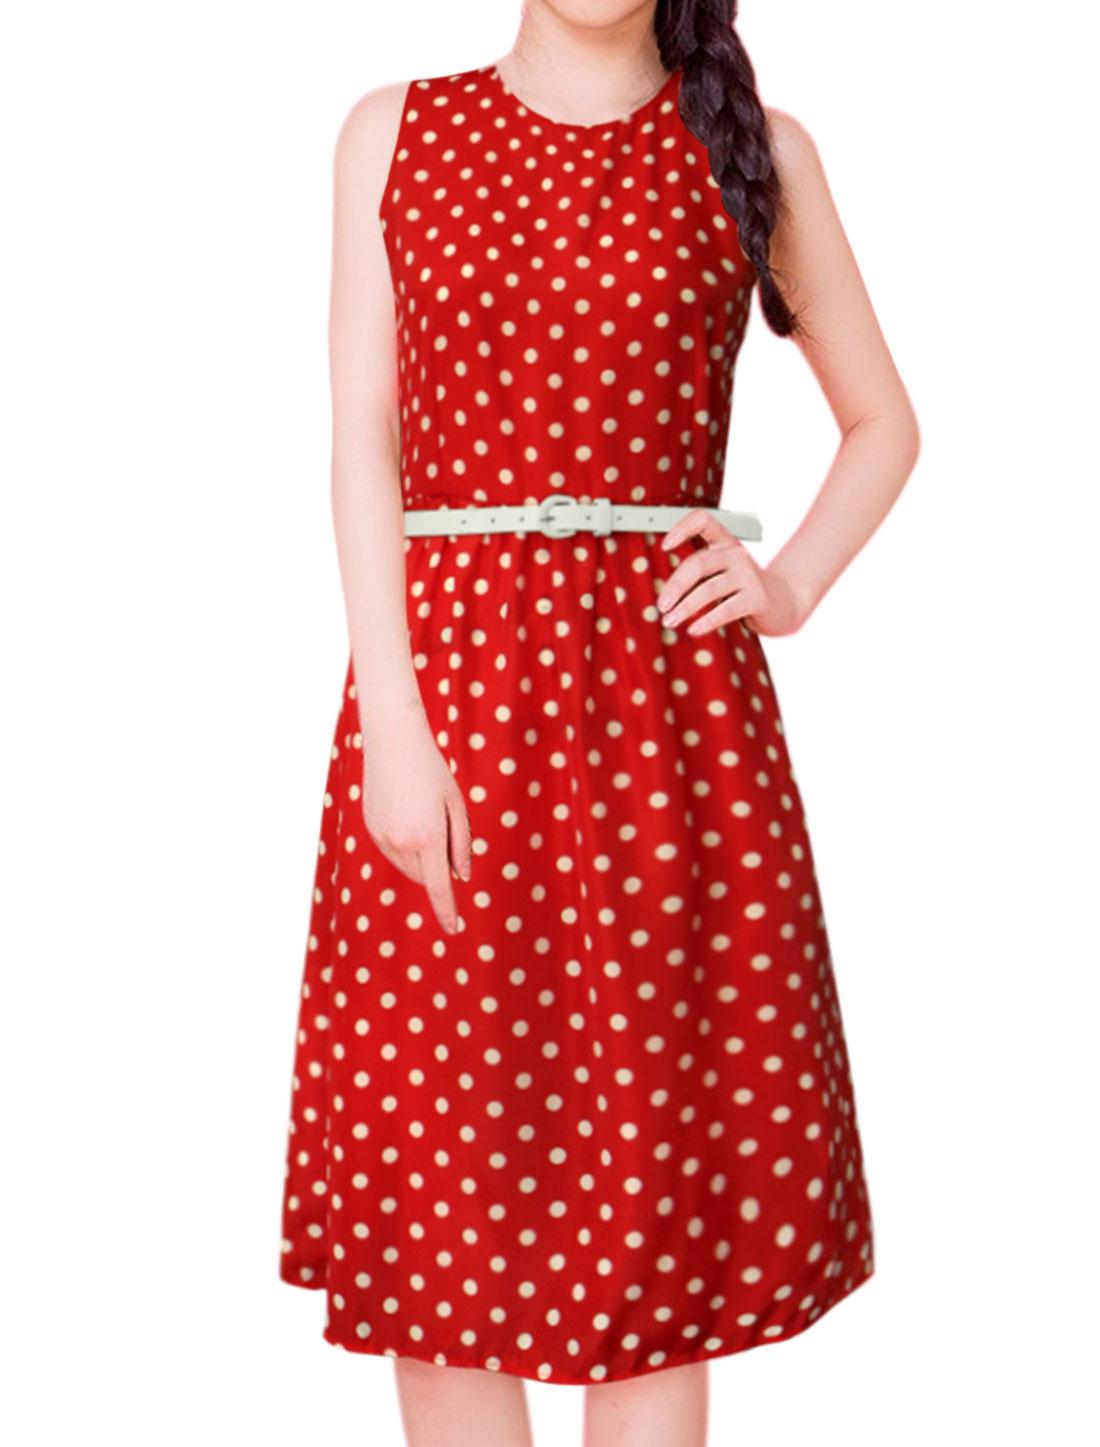 Women Polka Dots Print Sleeveless Belted A Line Dress Red M